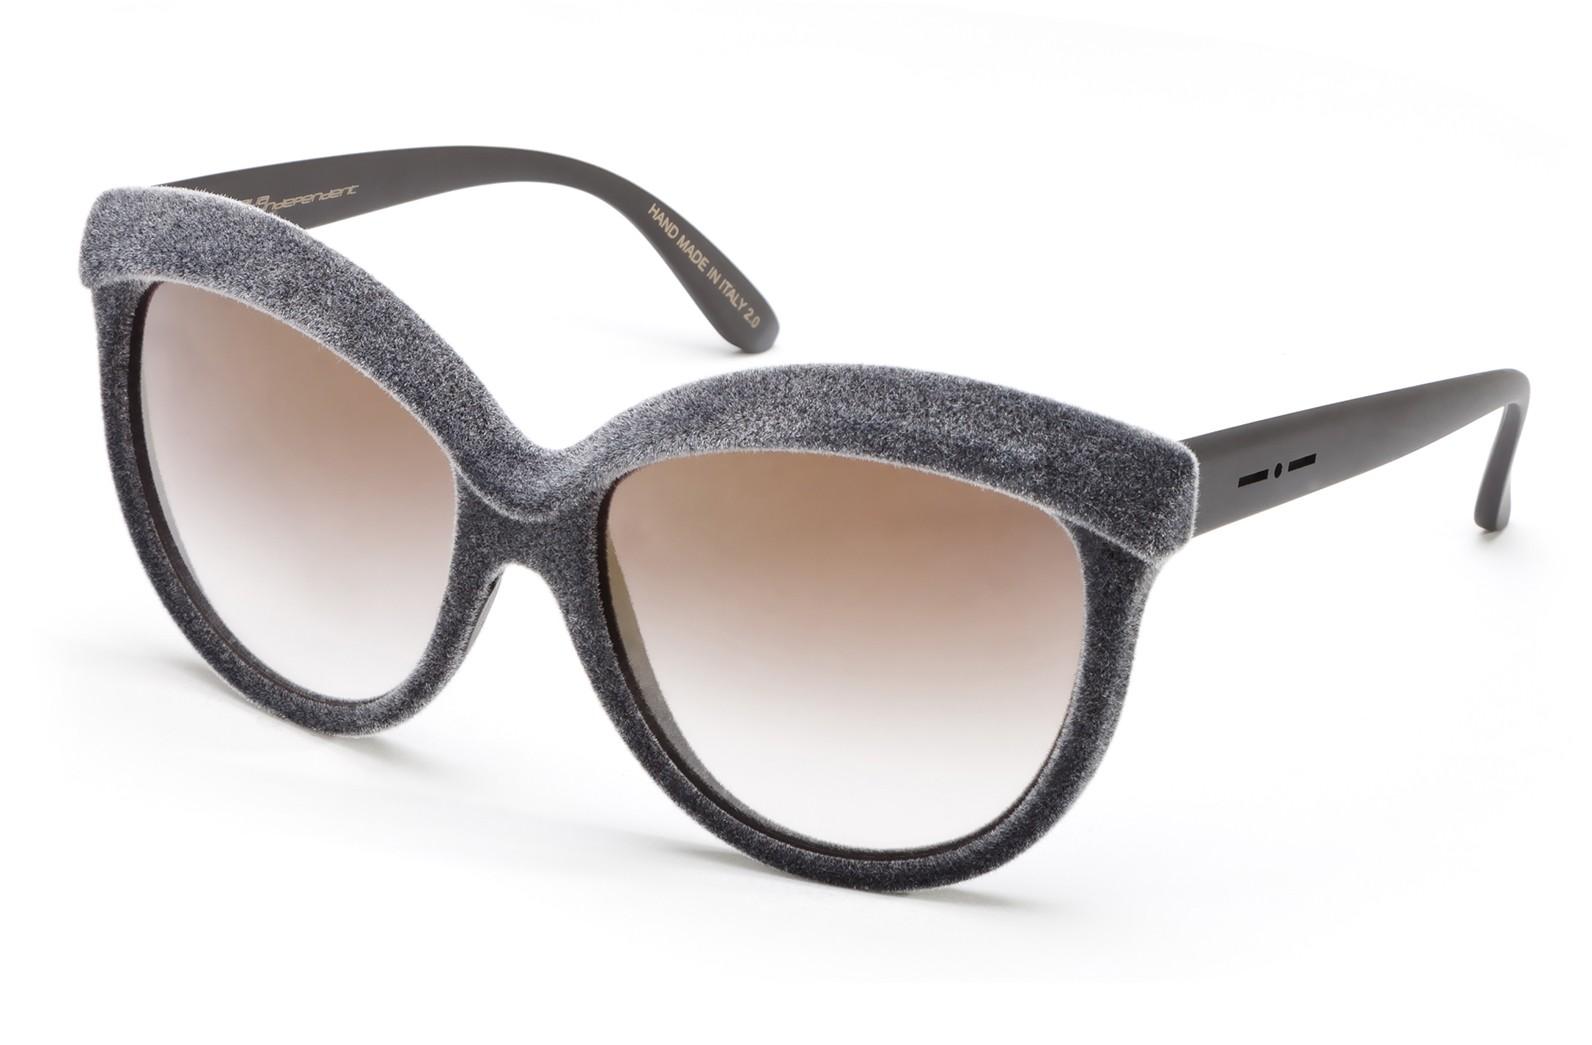 3b9987d407f1 Italia Independent - I-Plastik 0092V Velvet - Grey - 0092V.071.CNG -  Sunglasses - Italy Independent Eyewear - Avvenice